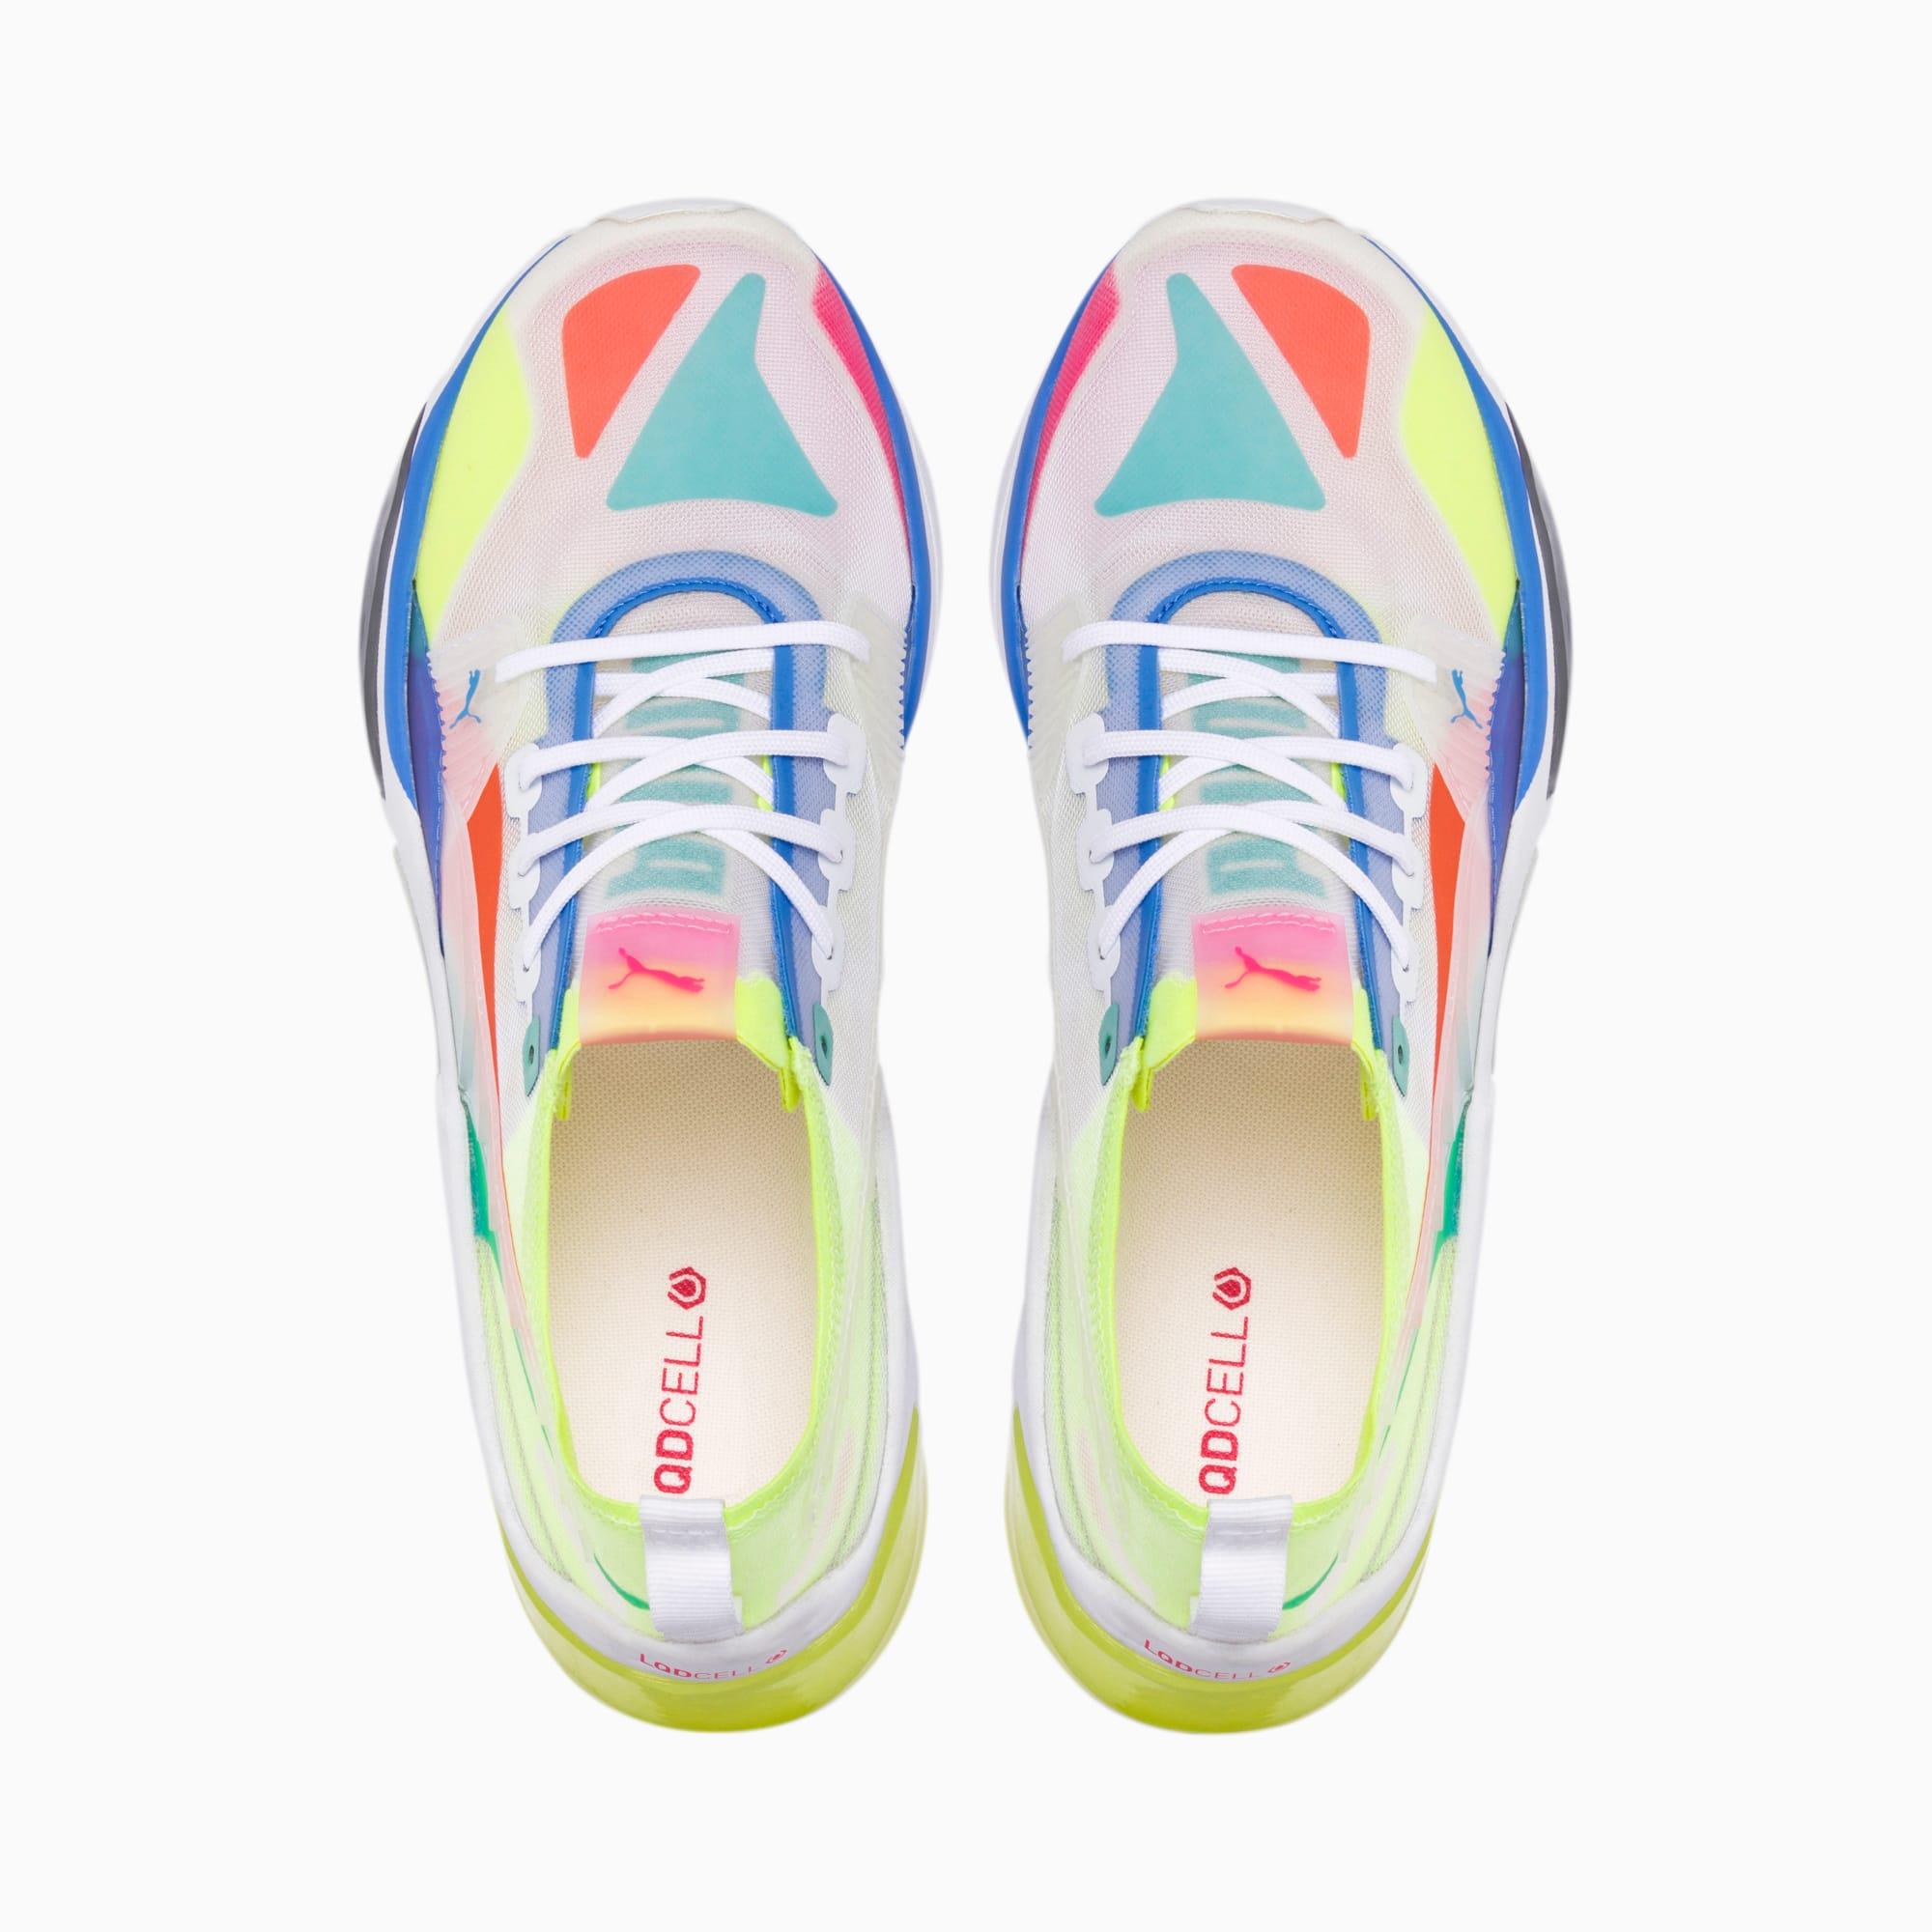 LQDCELL Optic Sheer Men's Training Shoes   PUMA US